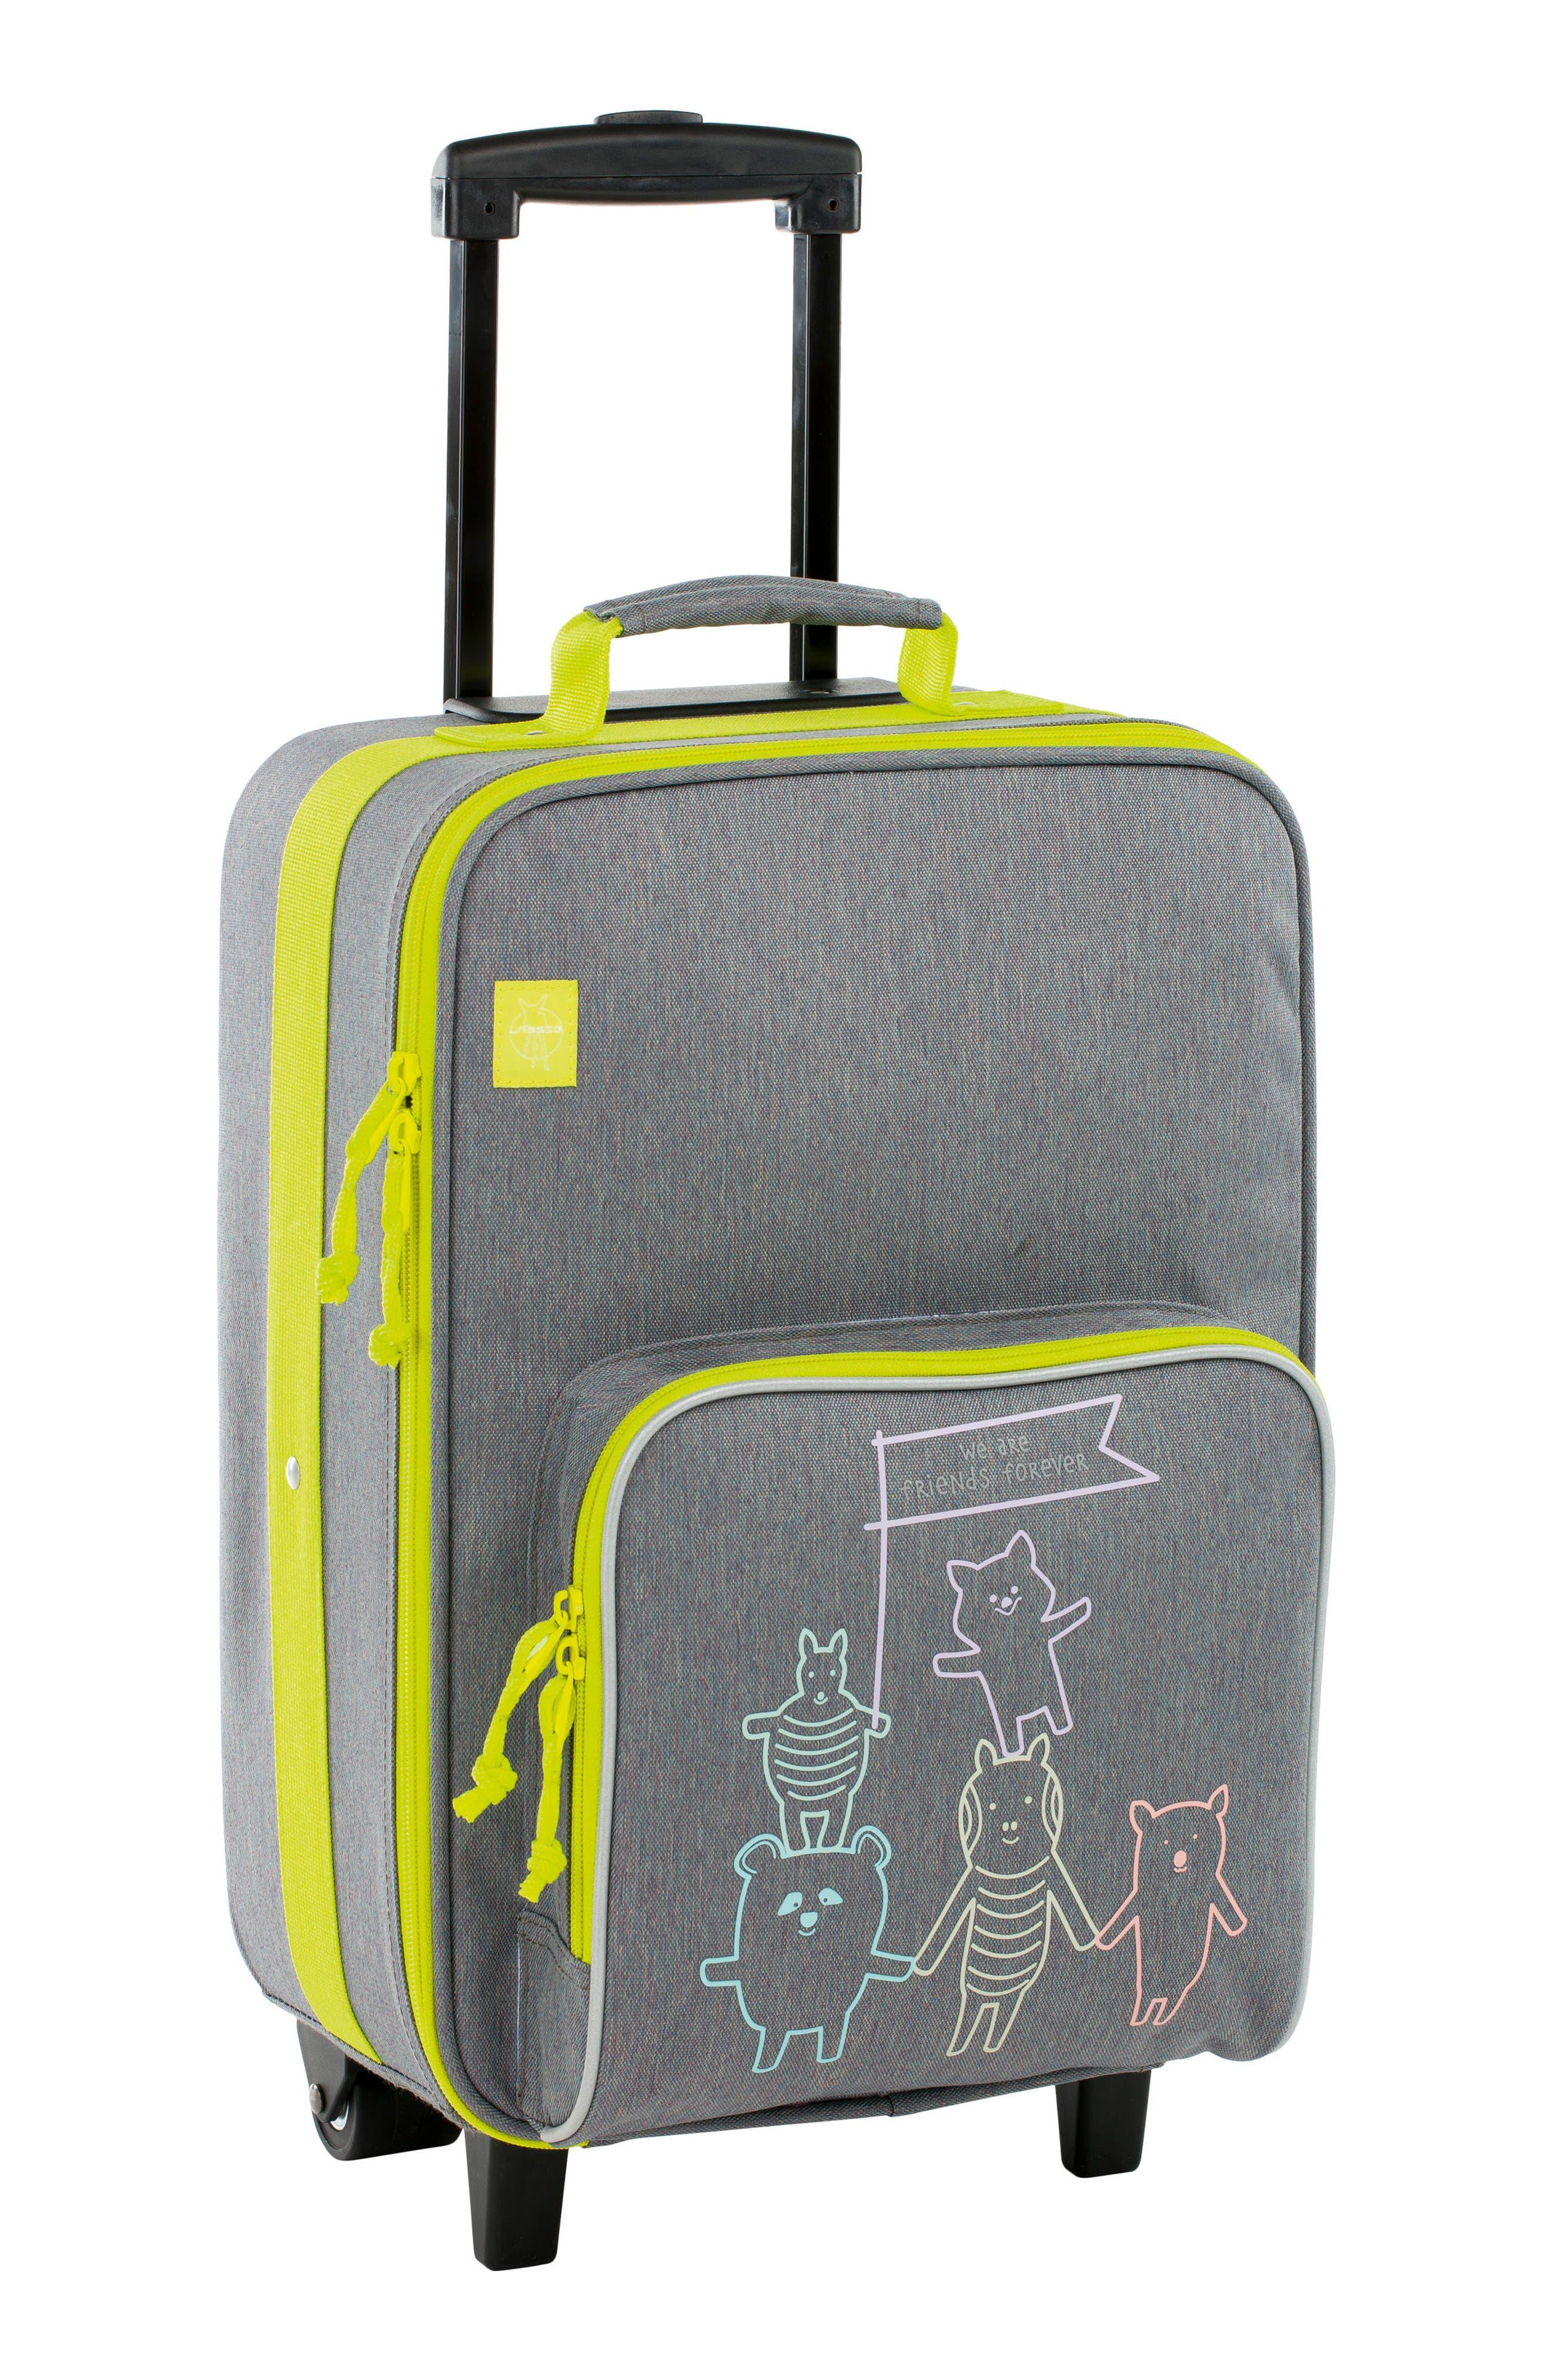 Lässig About Friends Rolling Suitcase (Kids)